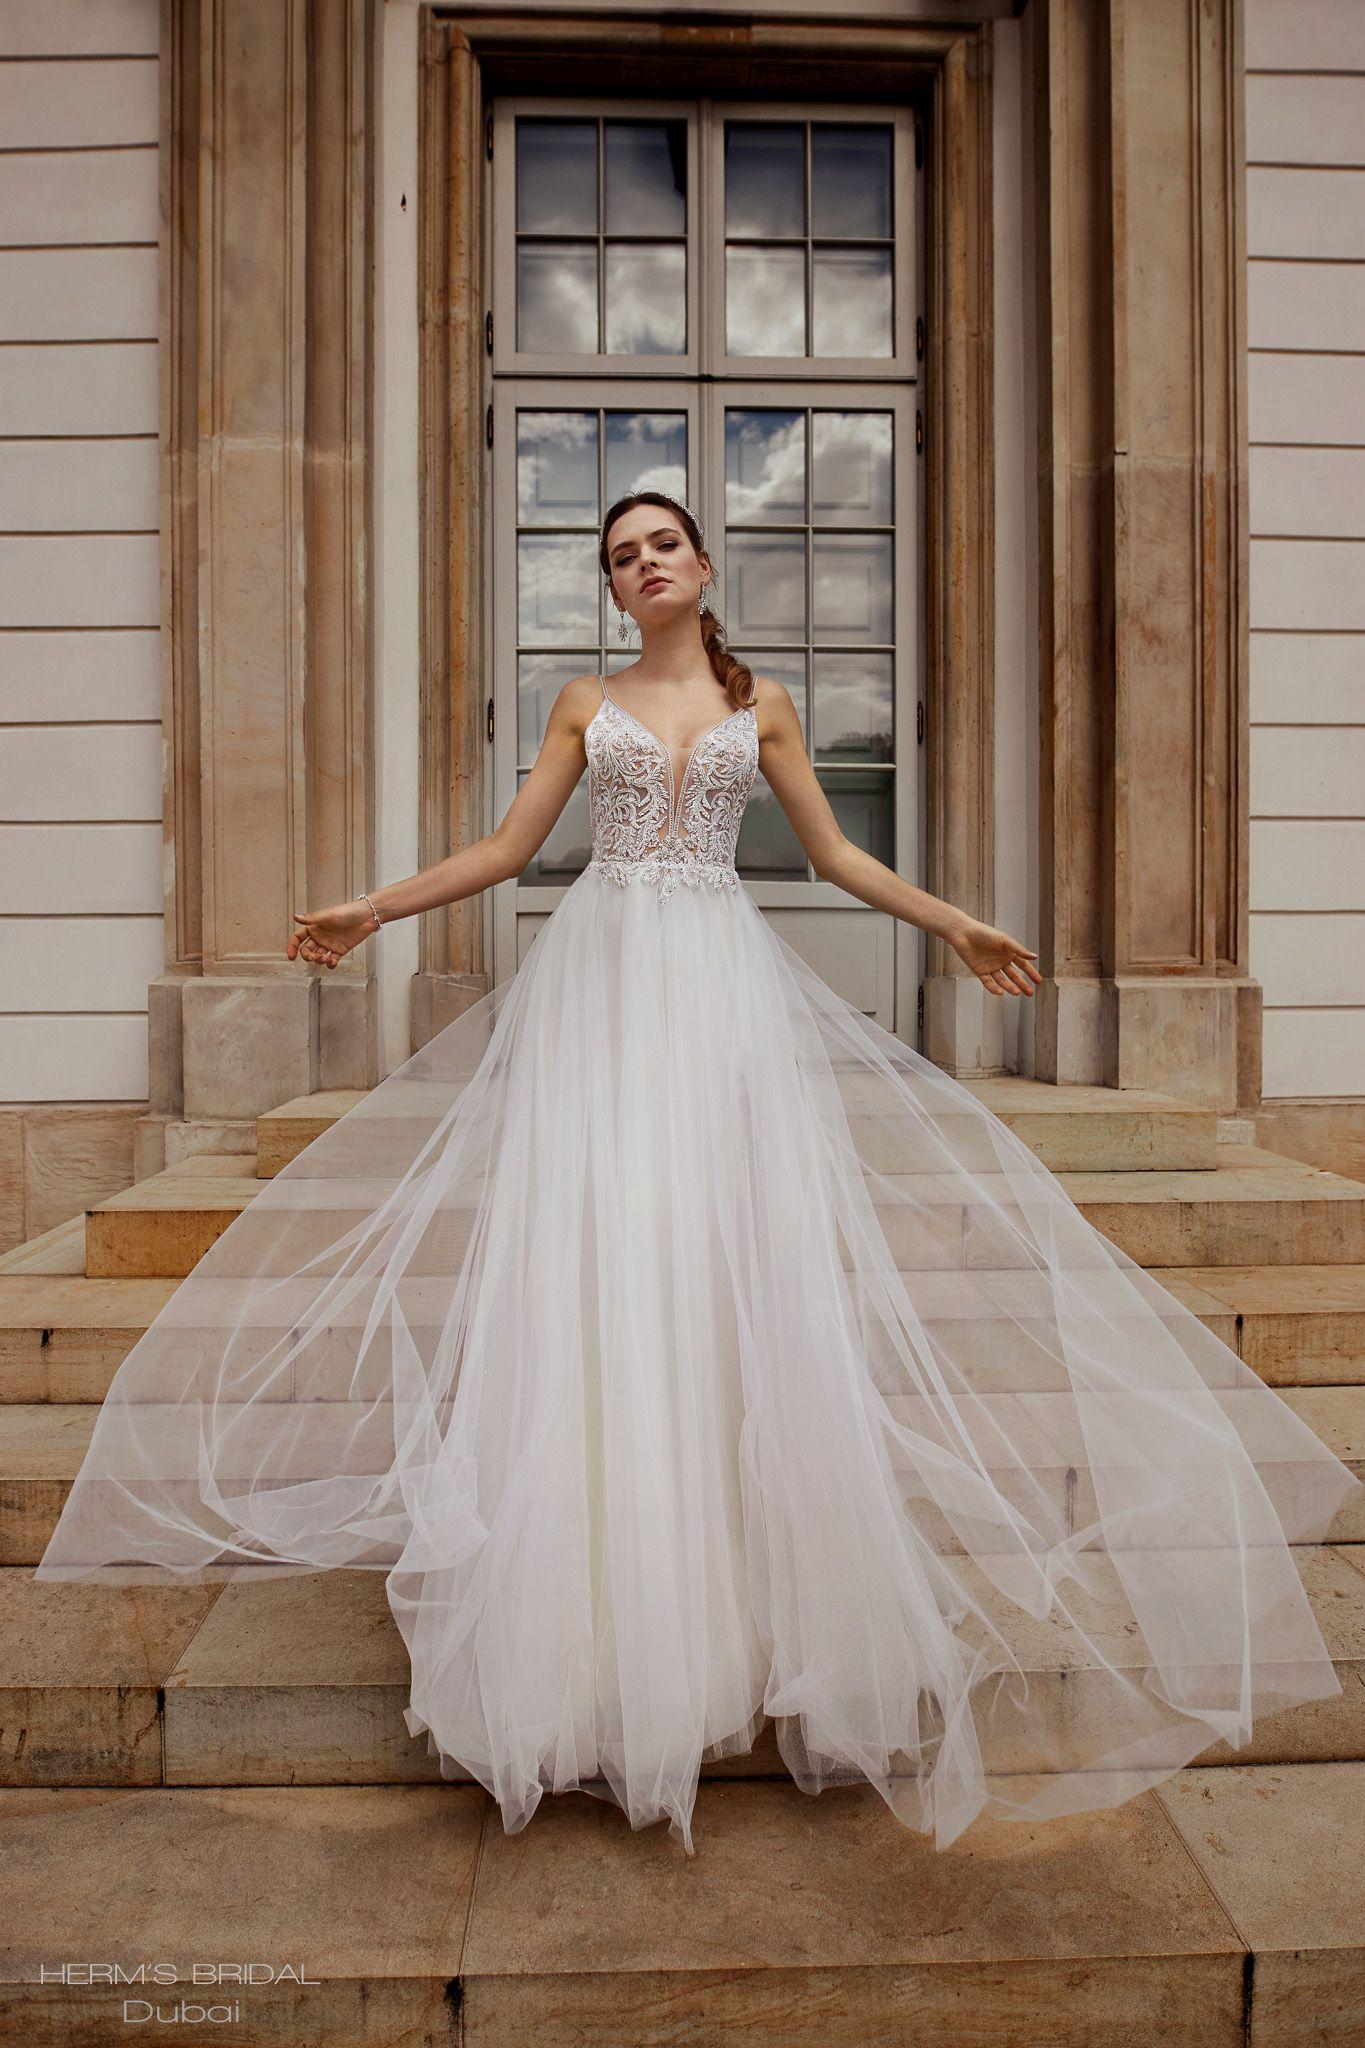 suknia slubna herms bridal Dubai 1